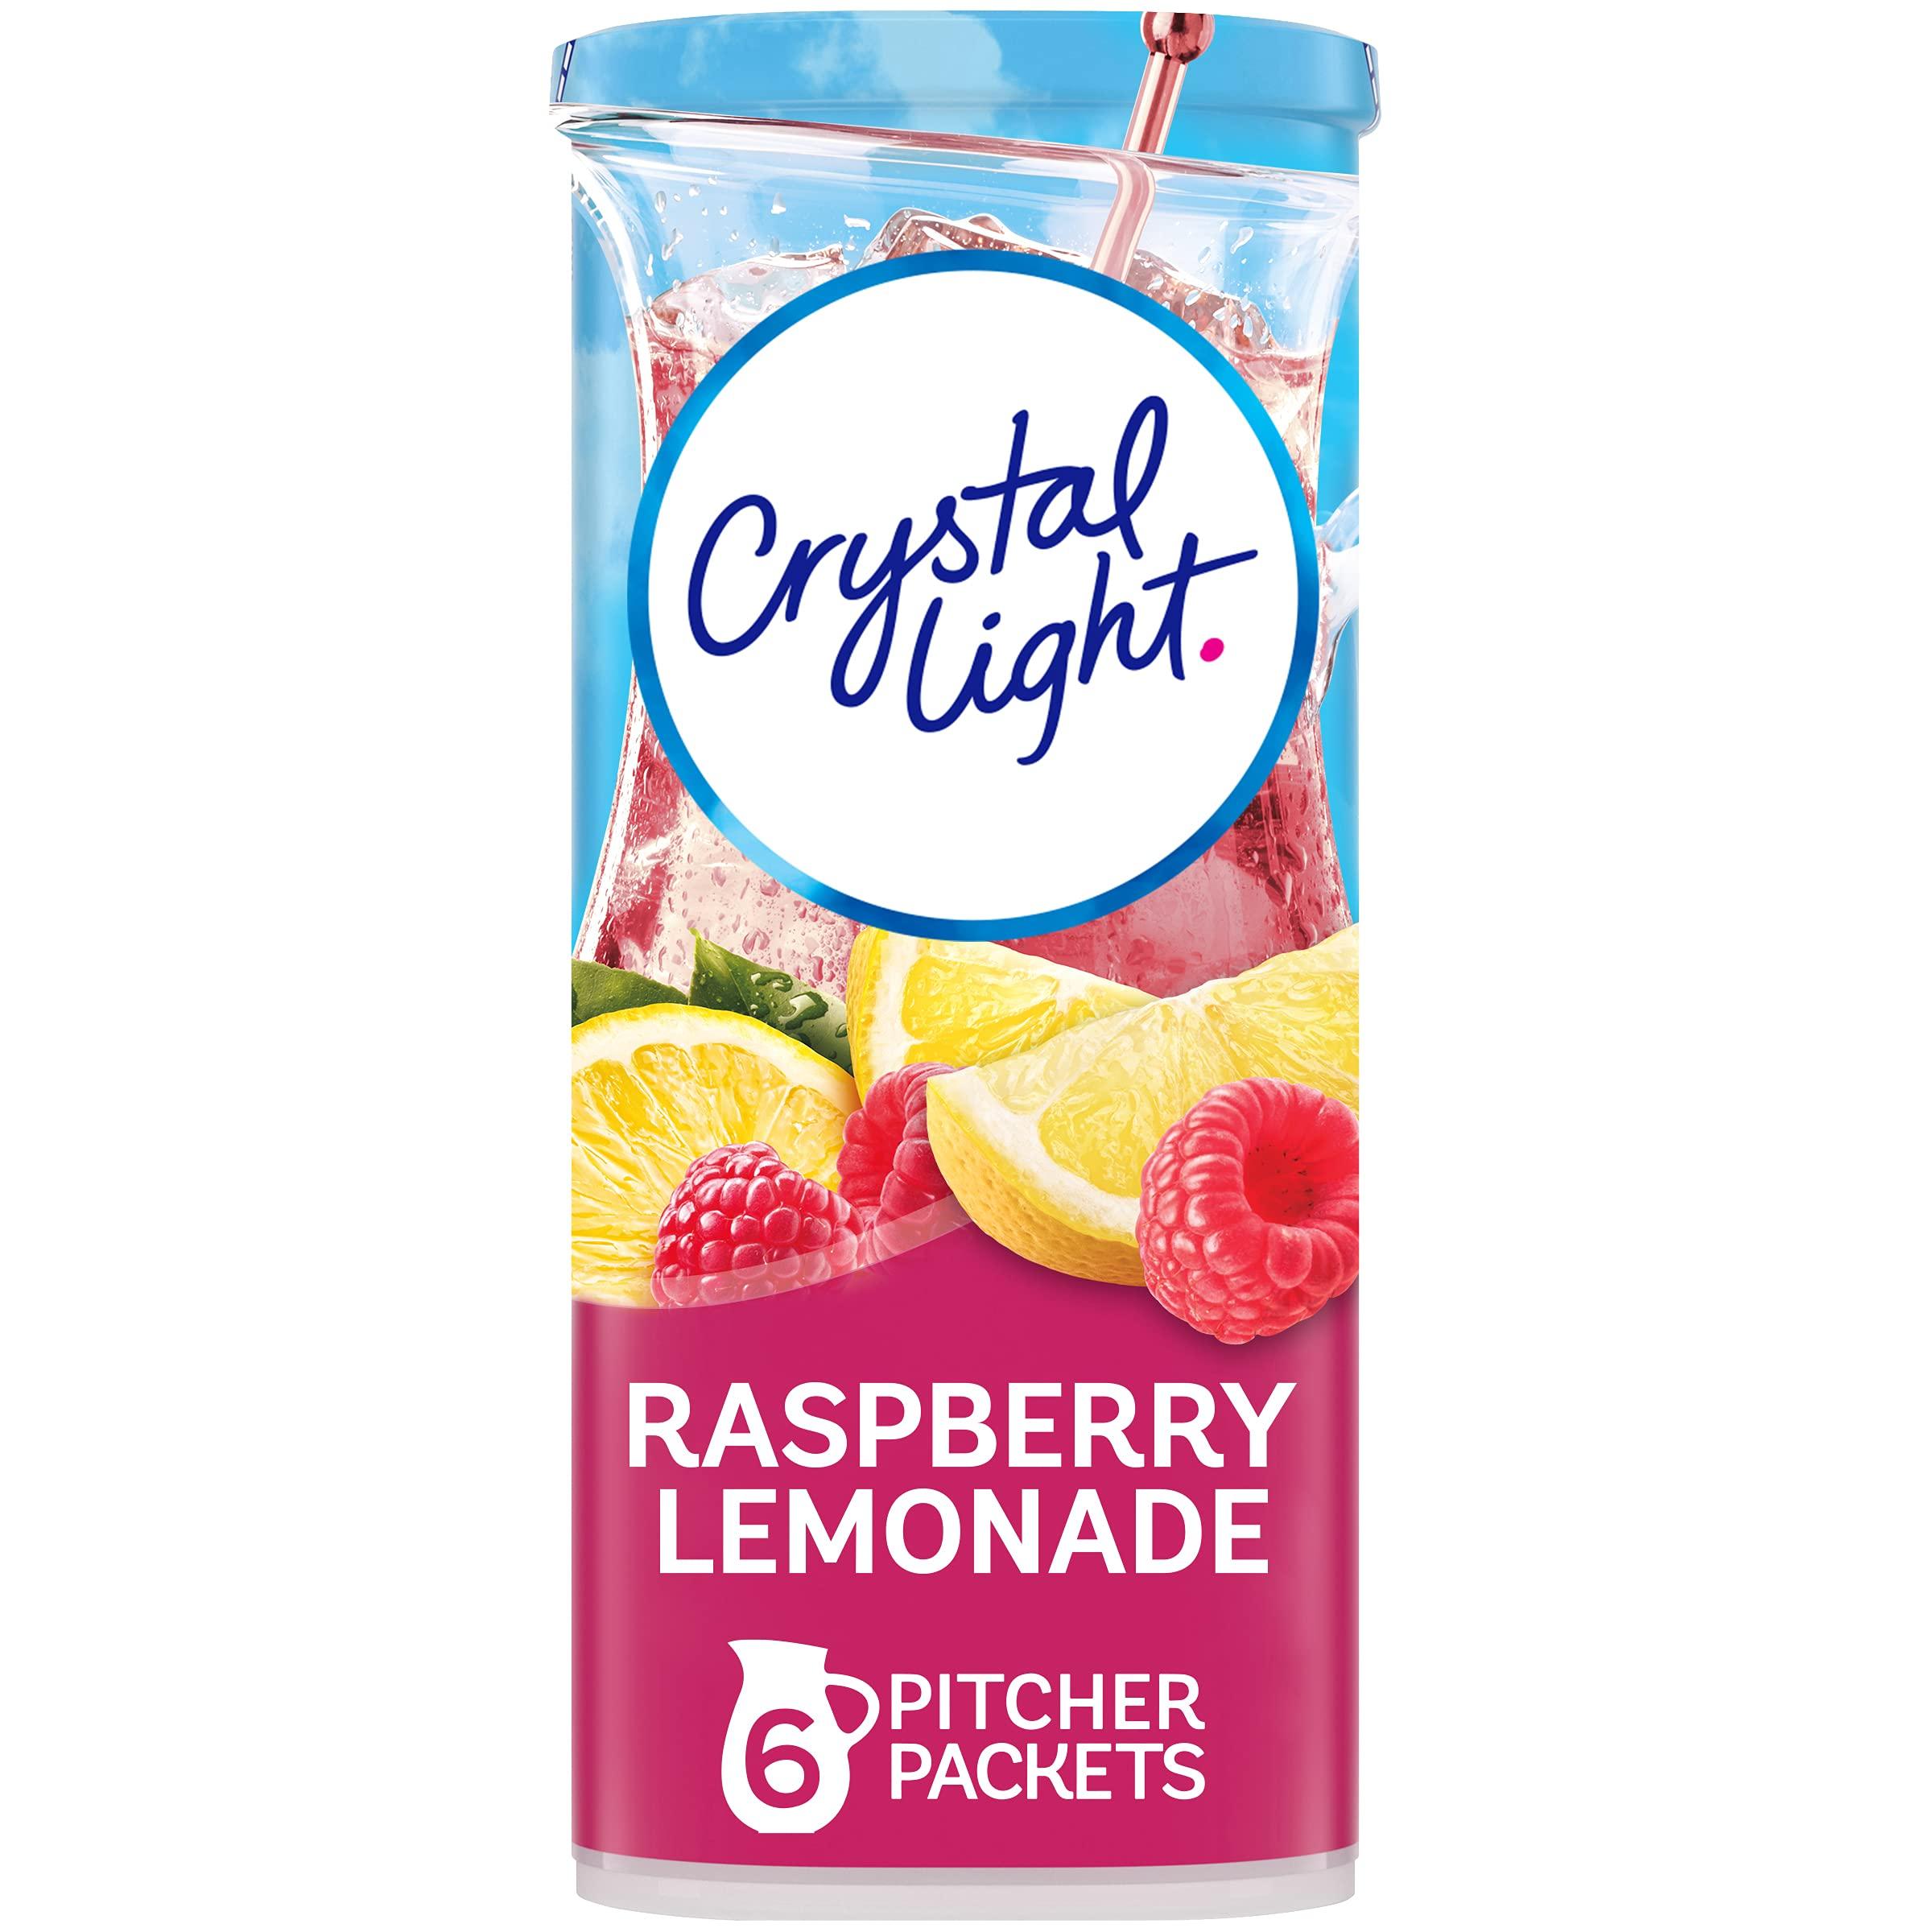 Crystal Light Raspberry Lemonade Drink Mix (72 Pitcher Packets, 12 Packs of 6)